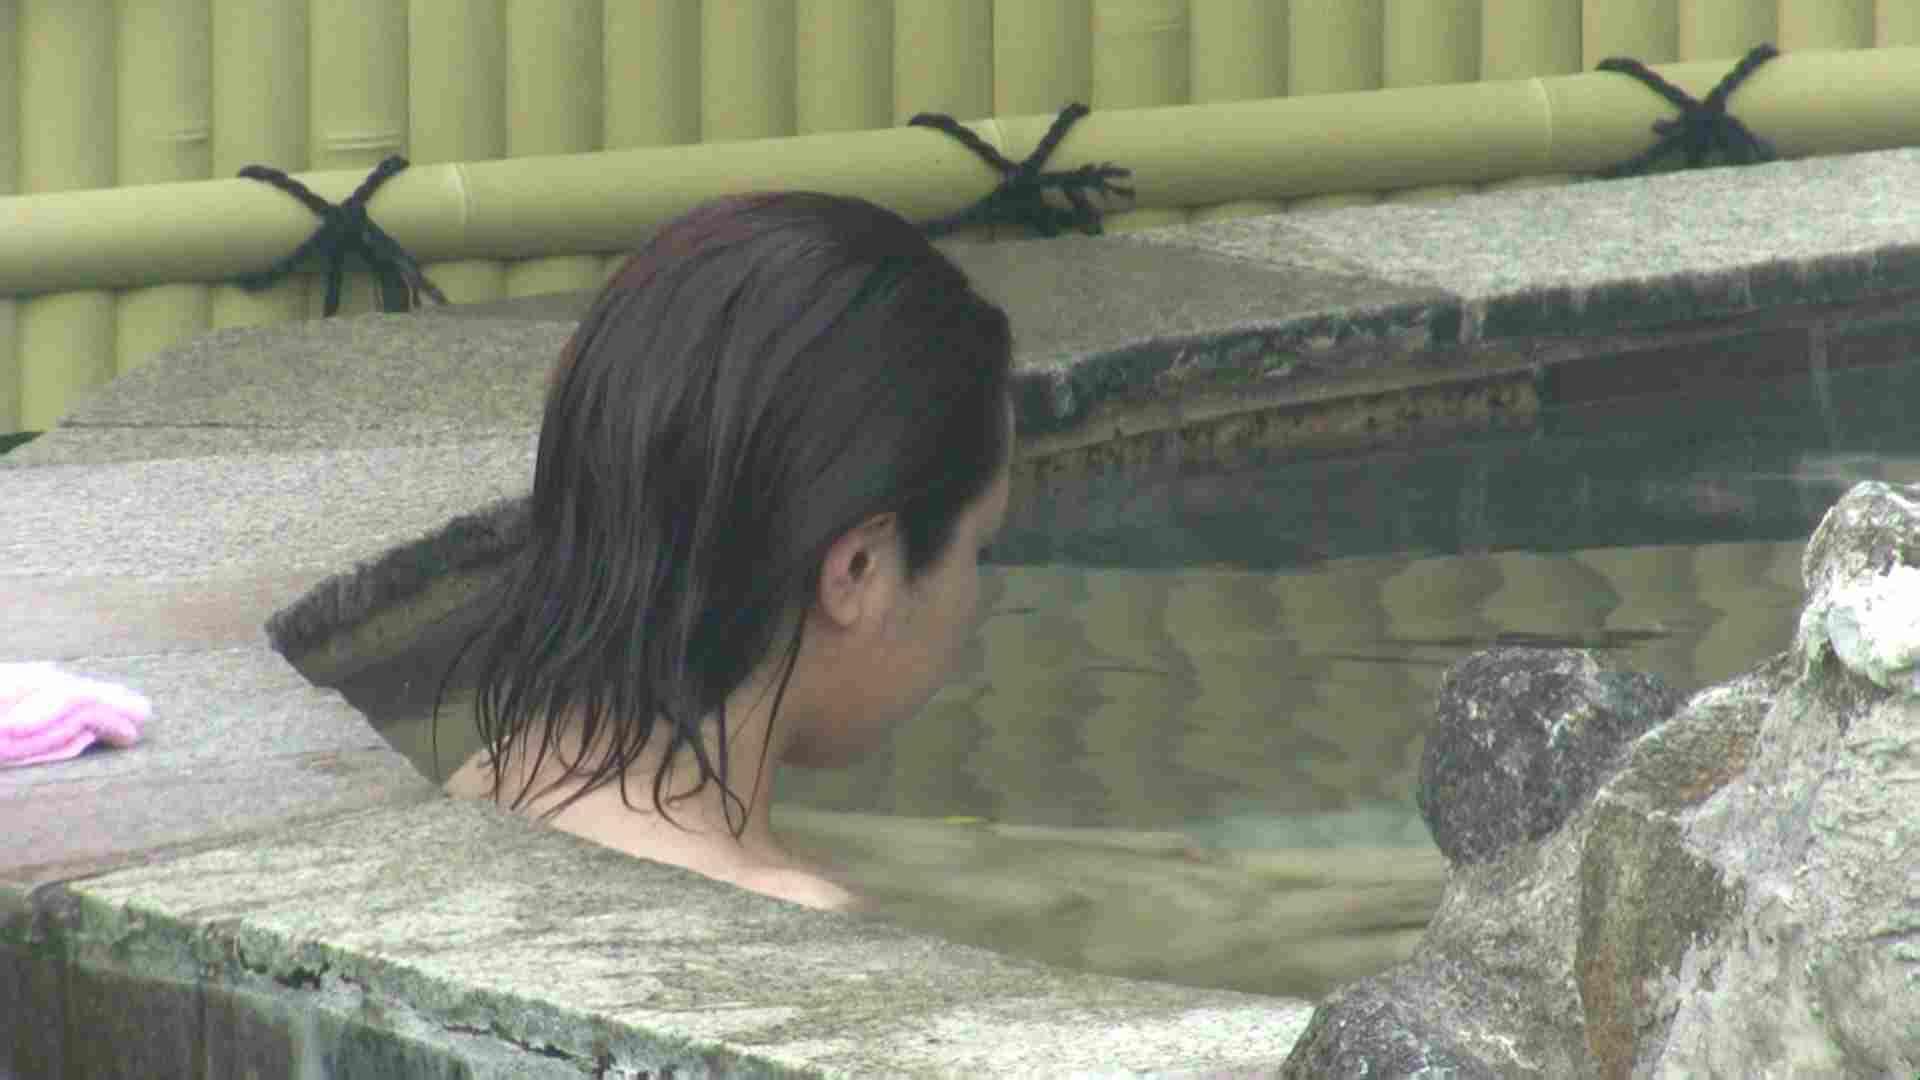 Aquaな露天風呂Vol.604 露天風呂編  89PIX 56